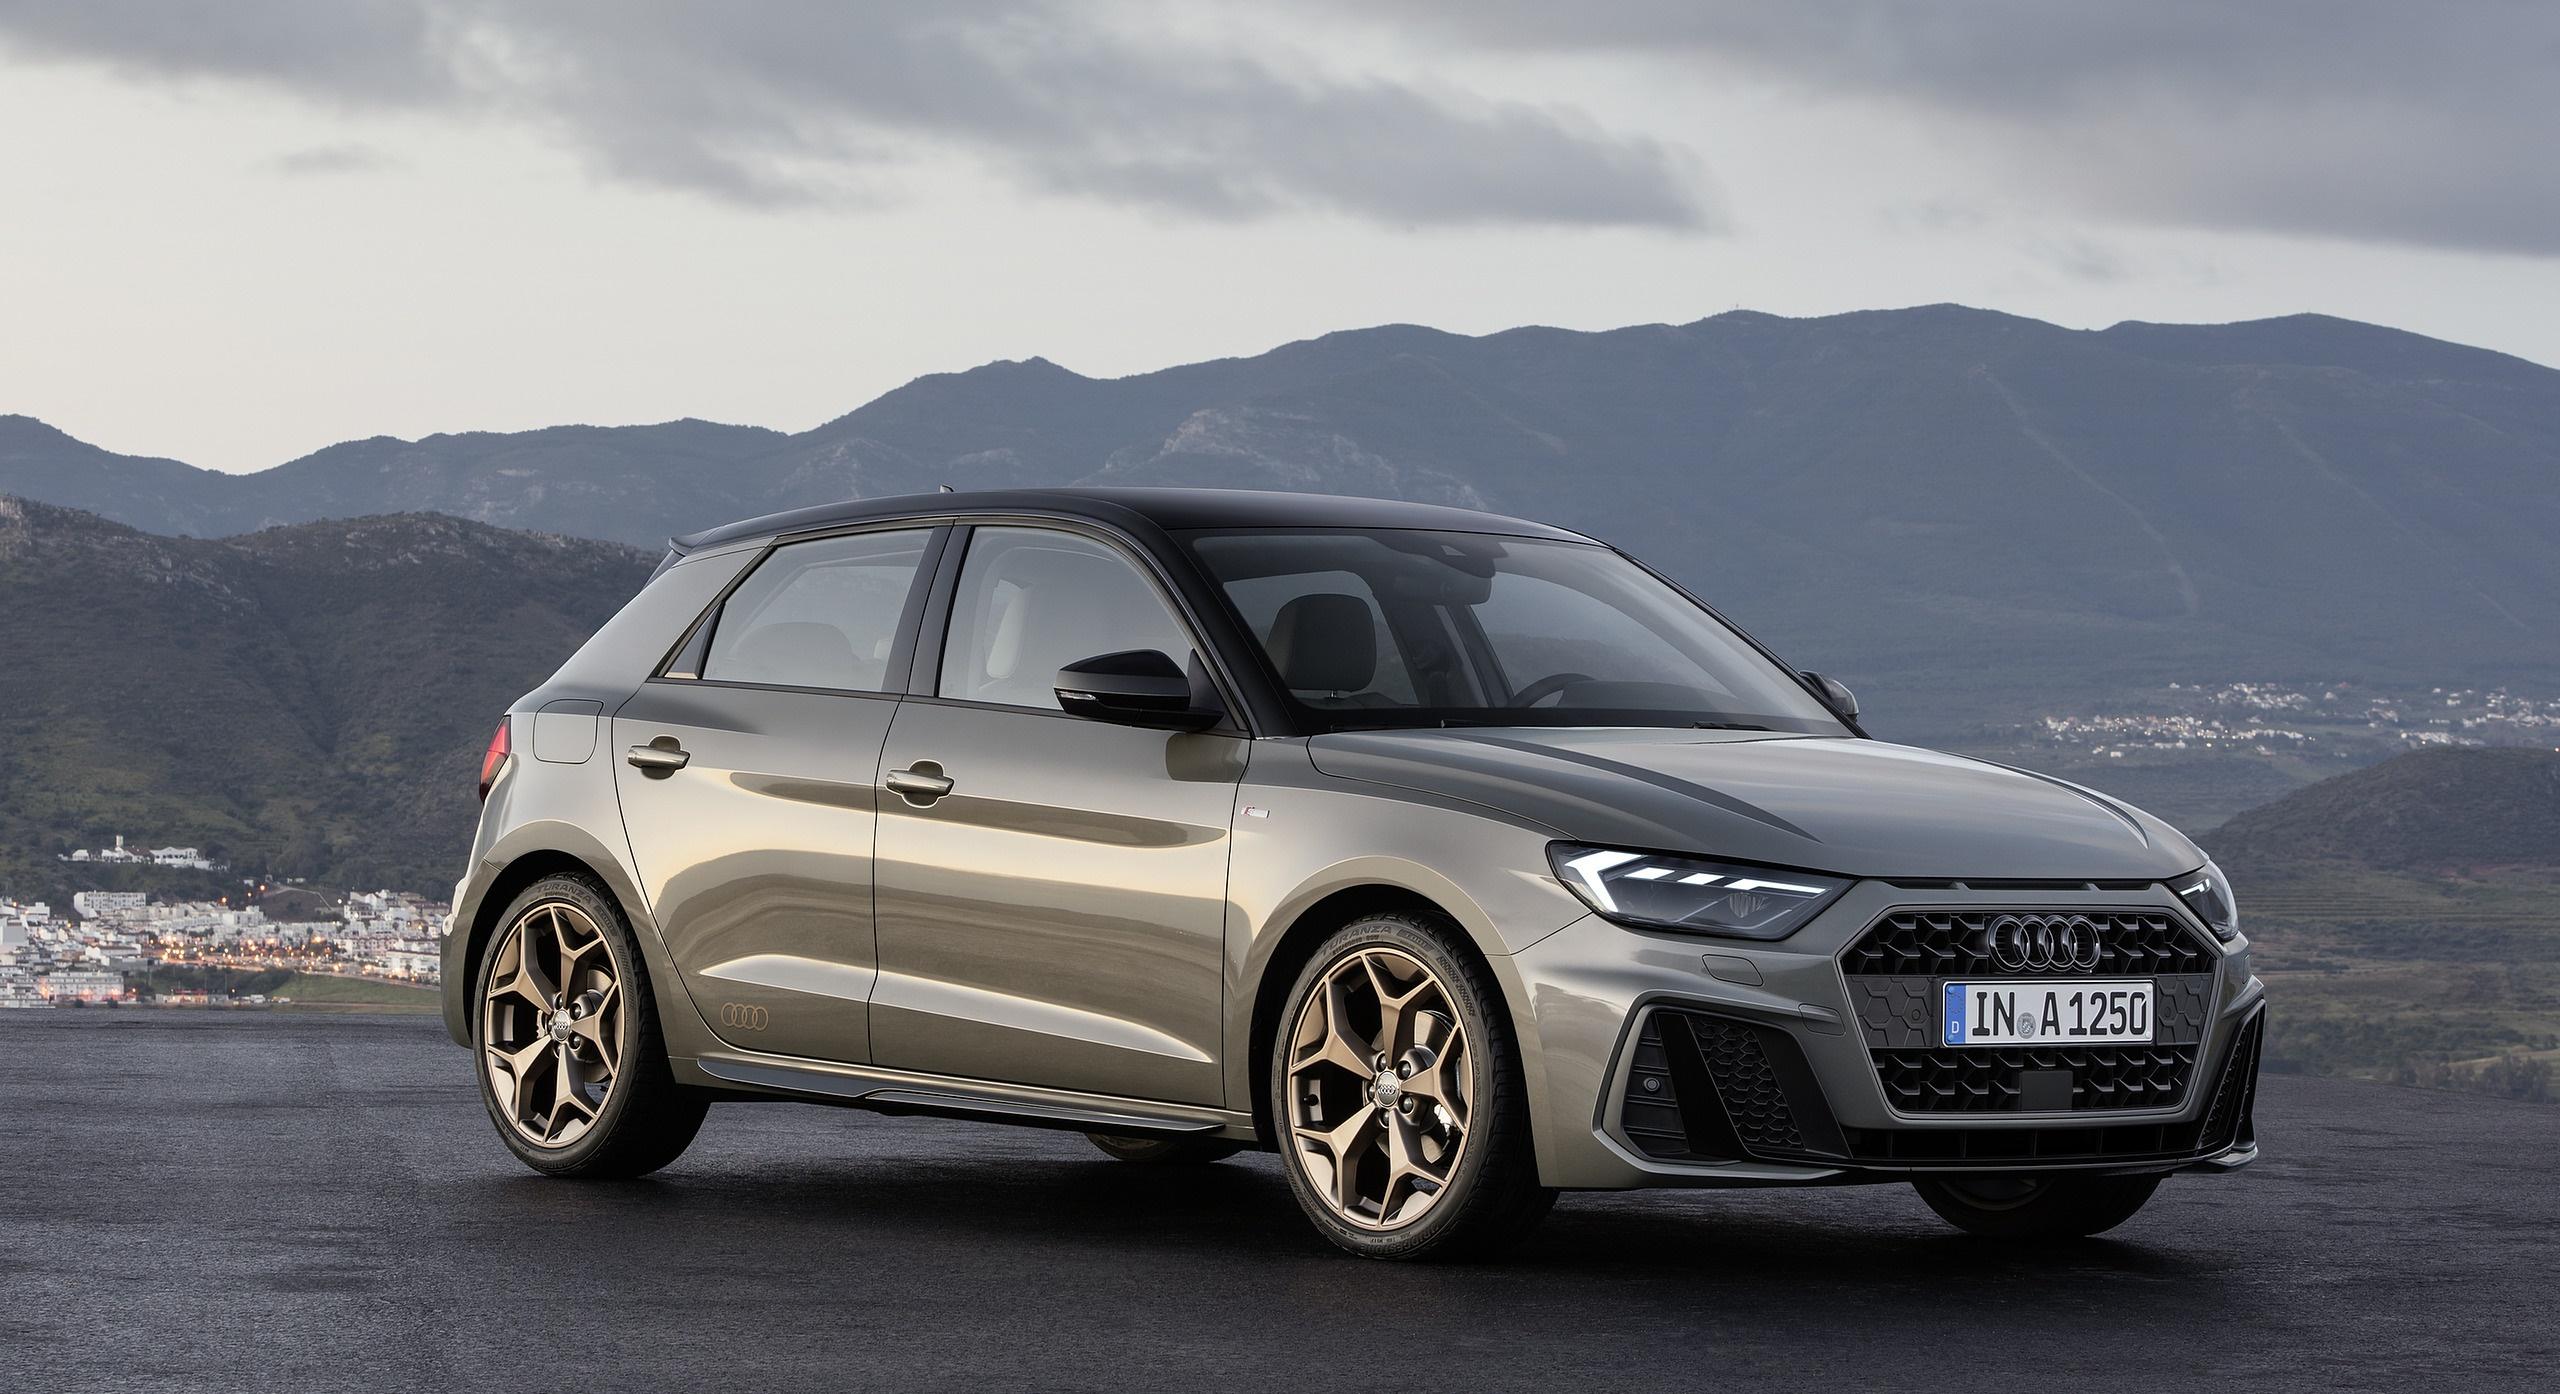 2019 Audi A1 Sportback (Color: Chronos Grey) Front Three-Quarter Wallpapers (3)